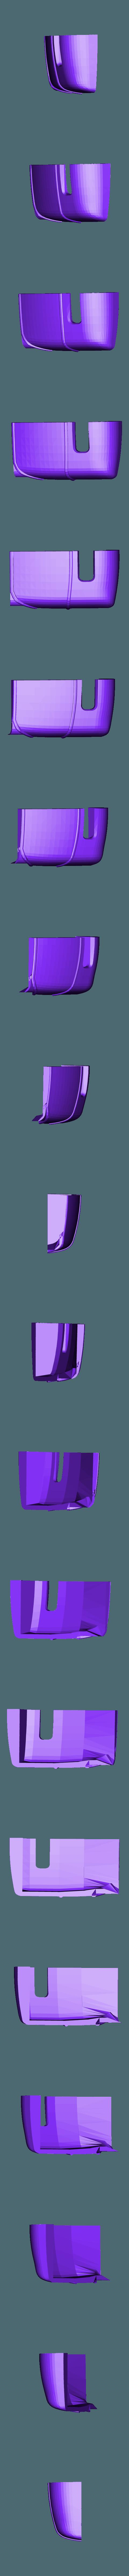 hotrod flanc  4.stl Download STL file Fury road hotrod bodyshell 1/10 • 3D printing design, RCGANG93